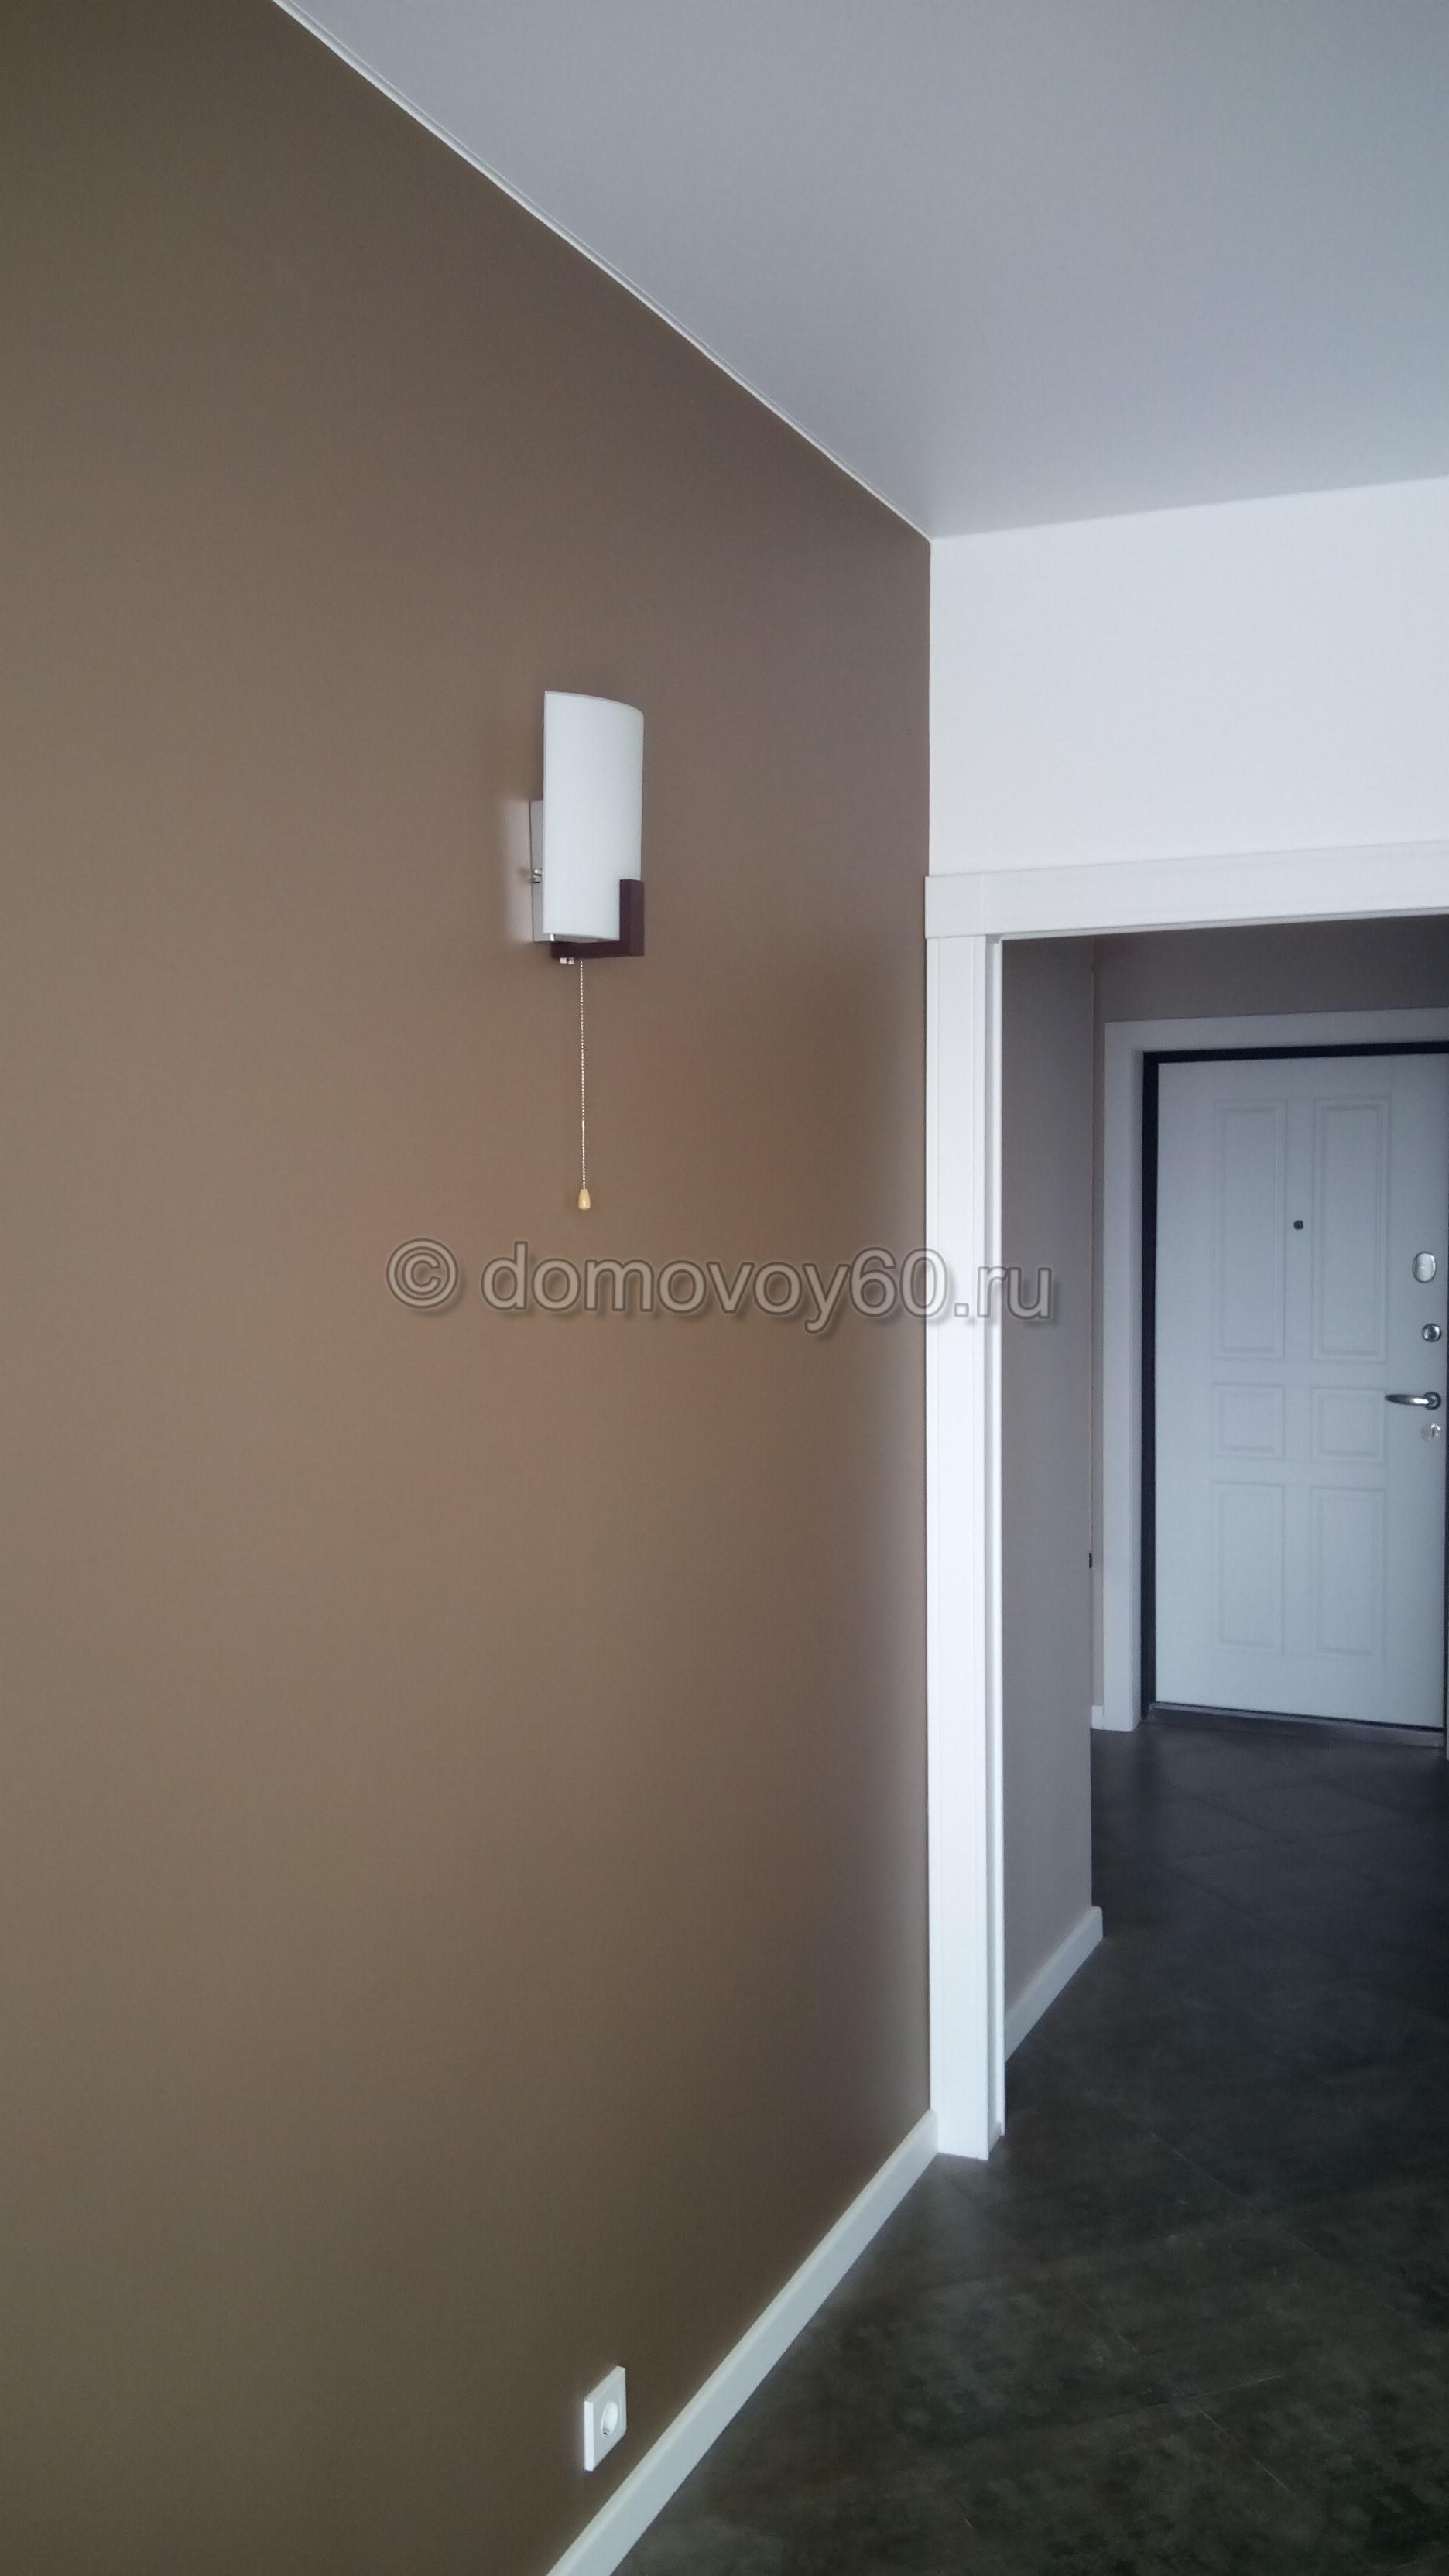 domovoy60-022